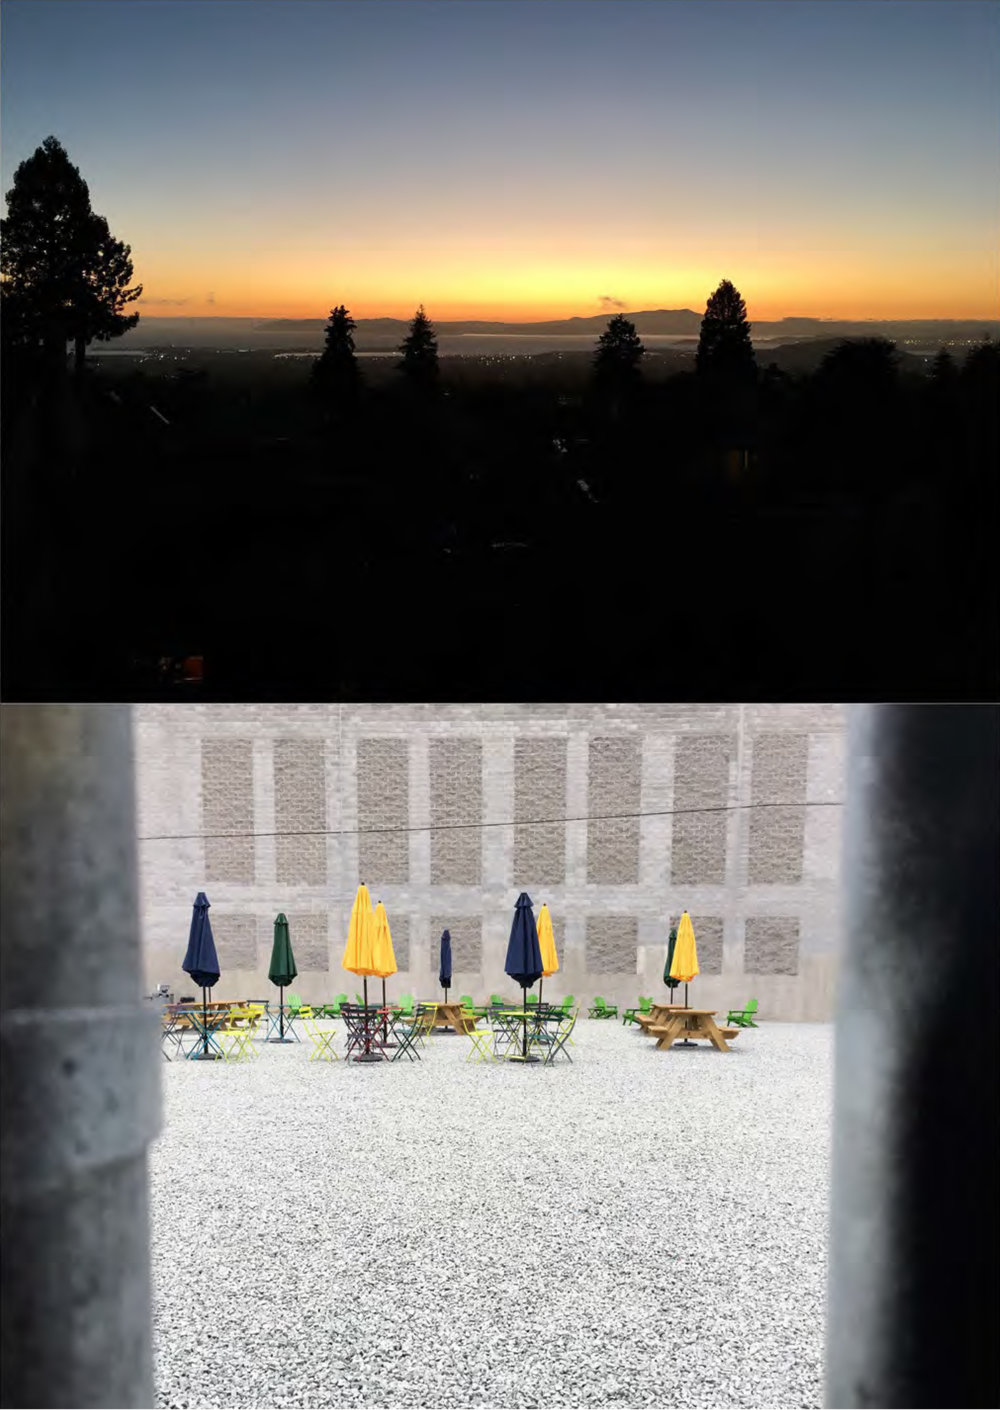 SunsetPatio (Oakland), 2018